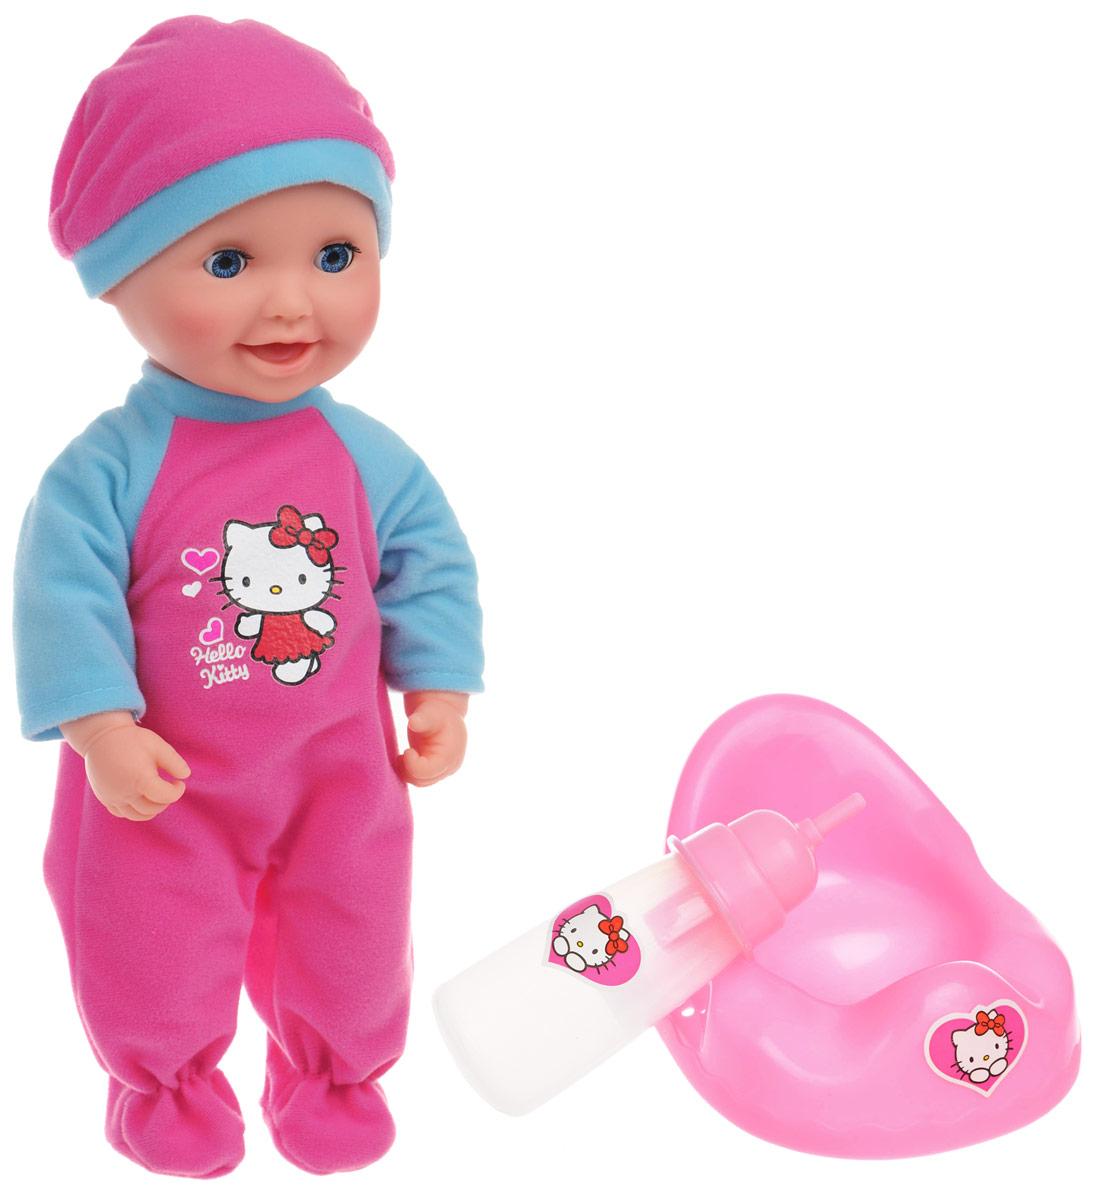 Карапуз Пупс Hello Kitty цвет одежды розовый голубой